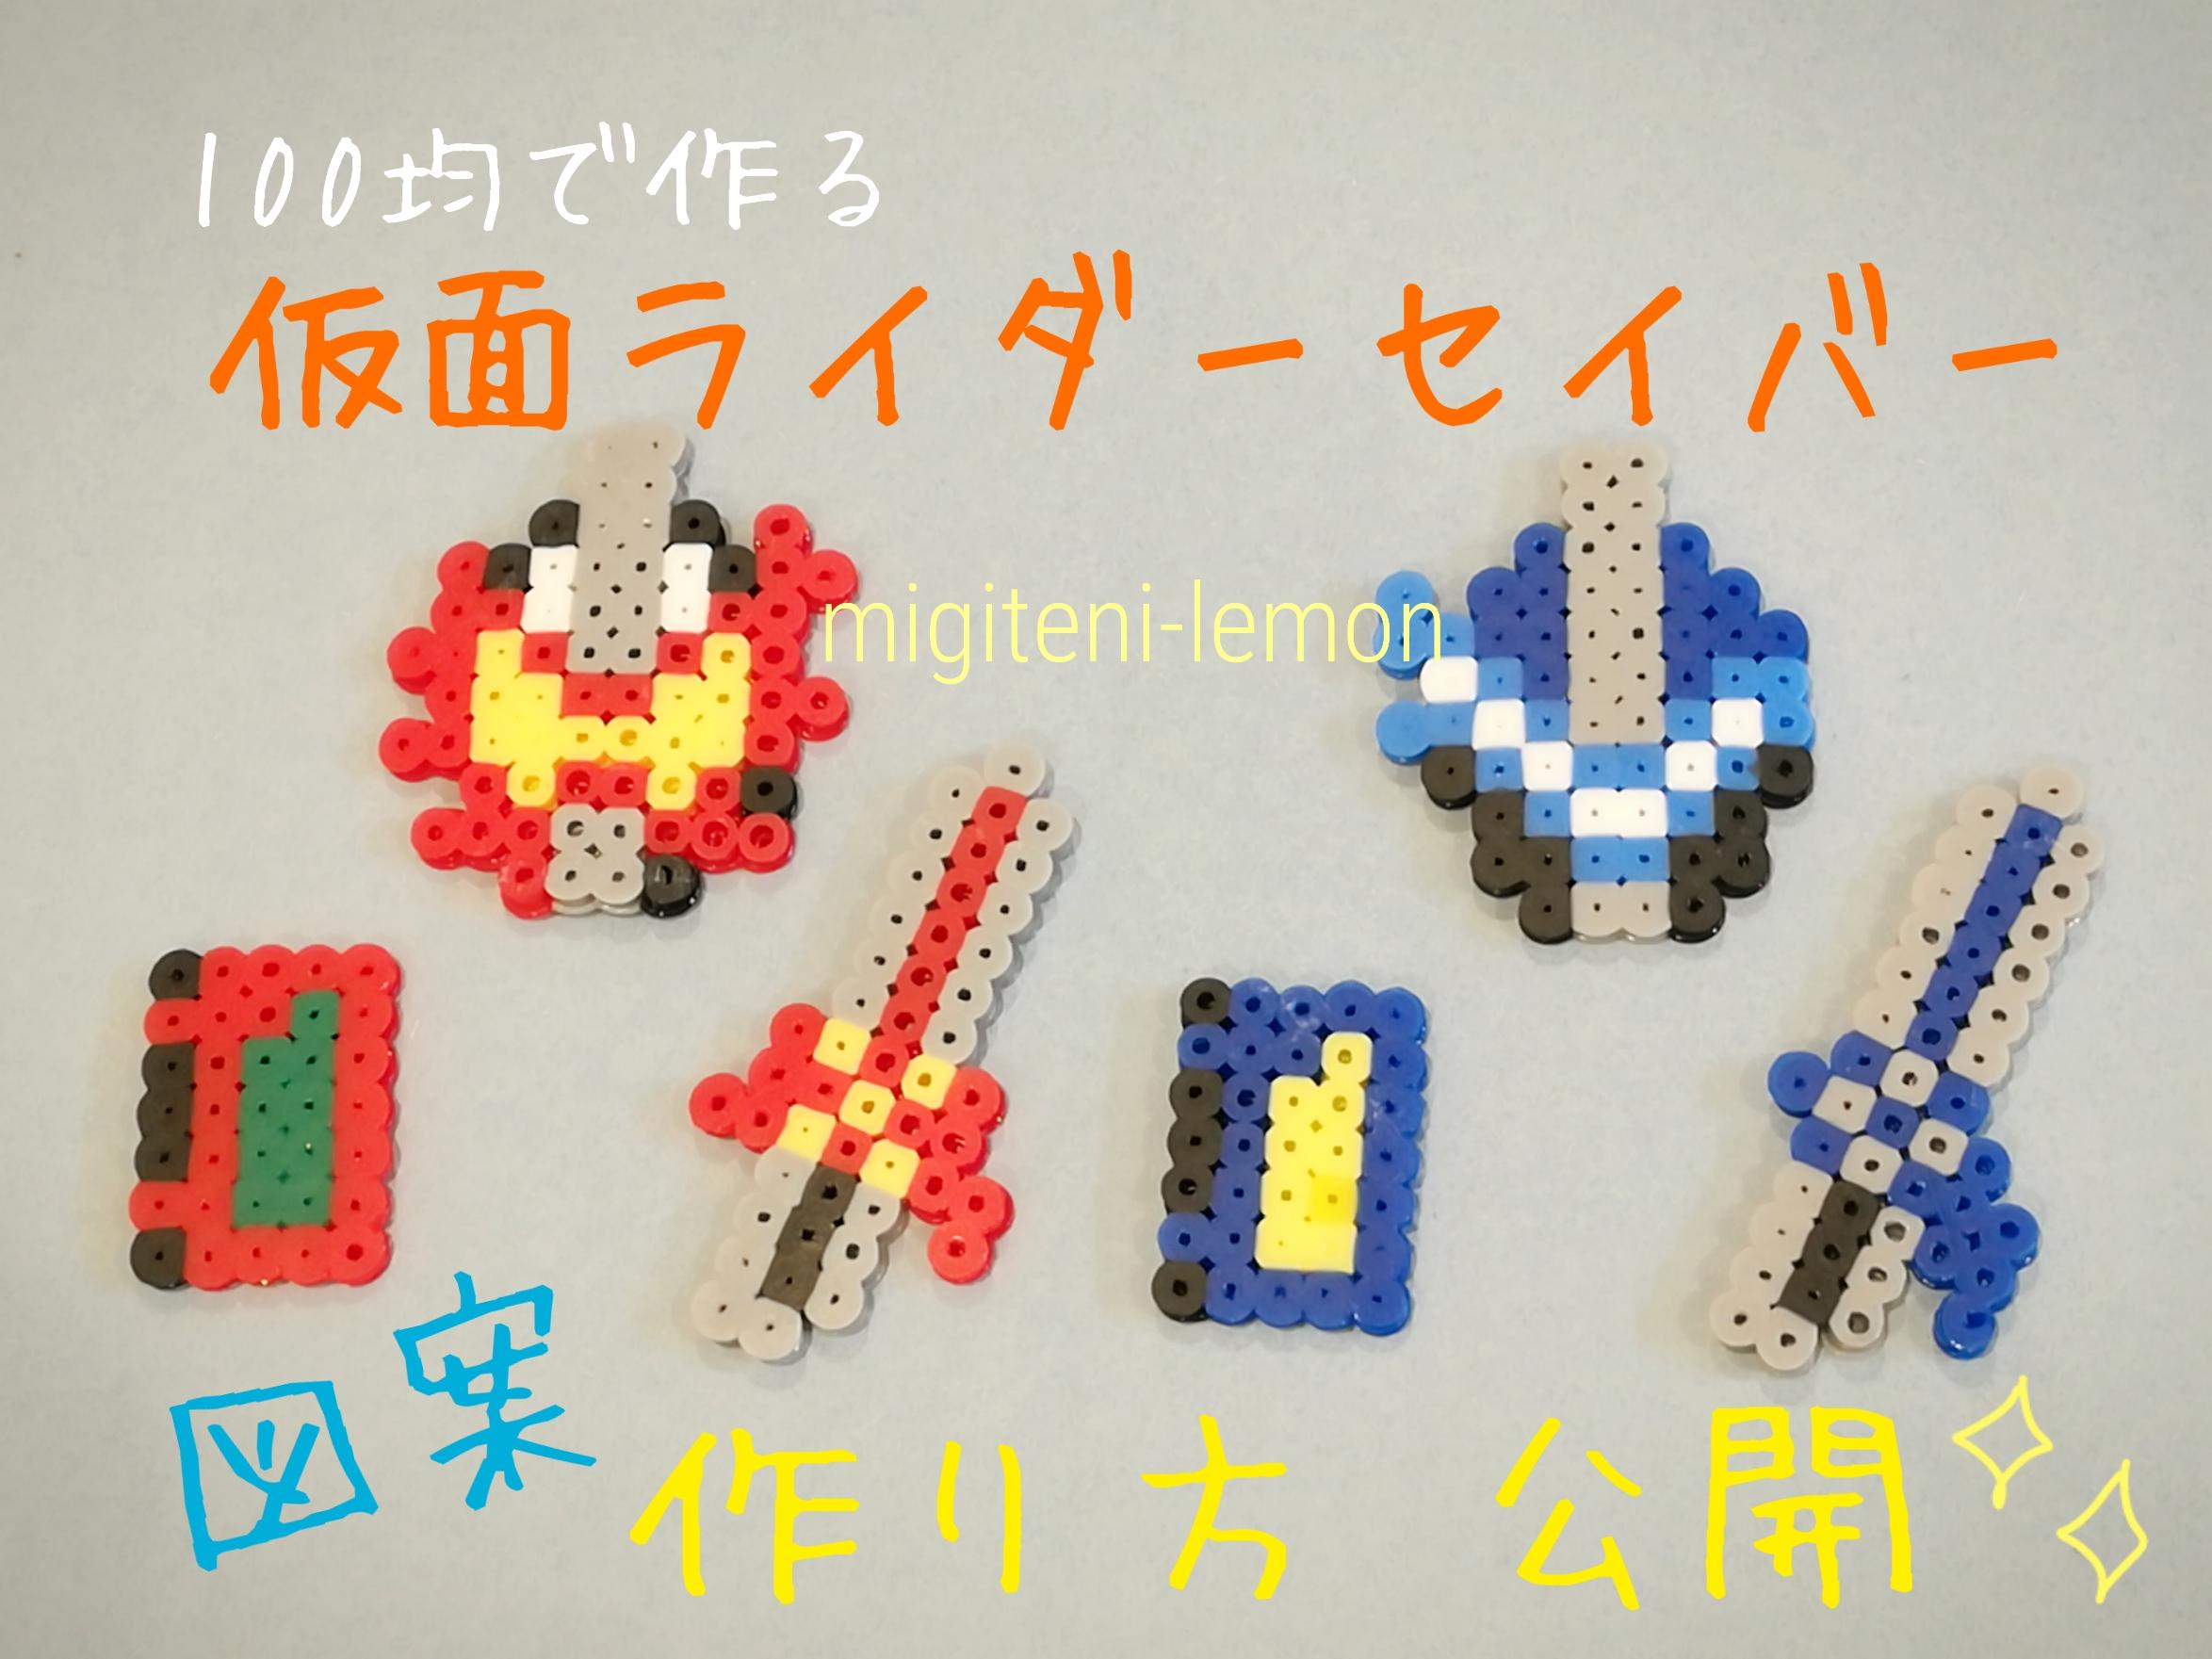 kamenrider-saber-handmade-beads